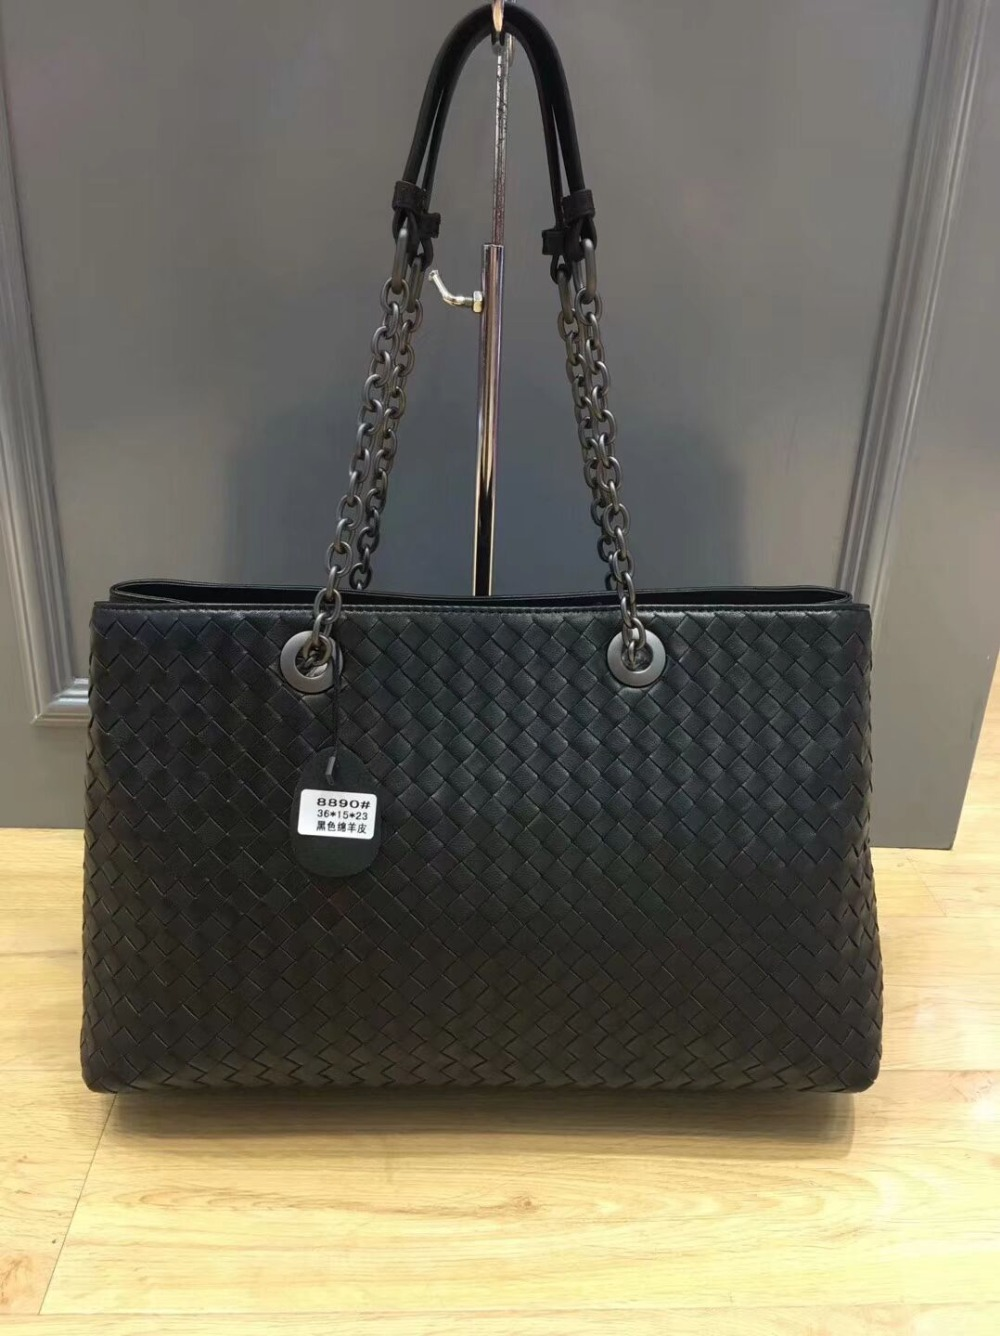 лучшая цена Chancelove fashion designer handbags genuine leather shoulder bag sheepskin weave large shopping bag brand handmade totes